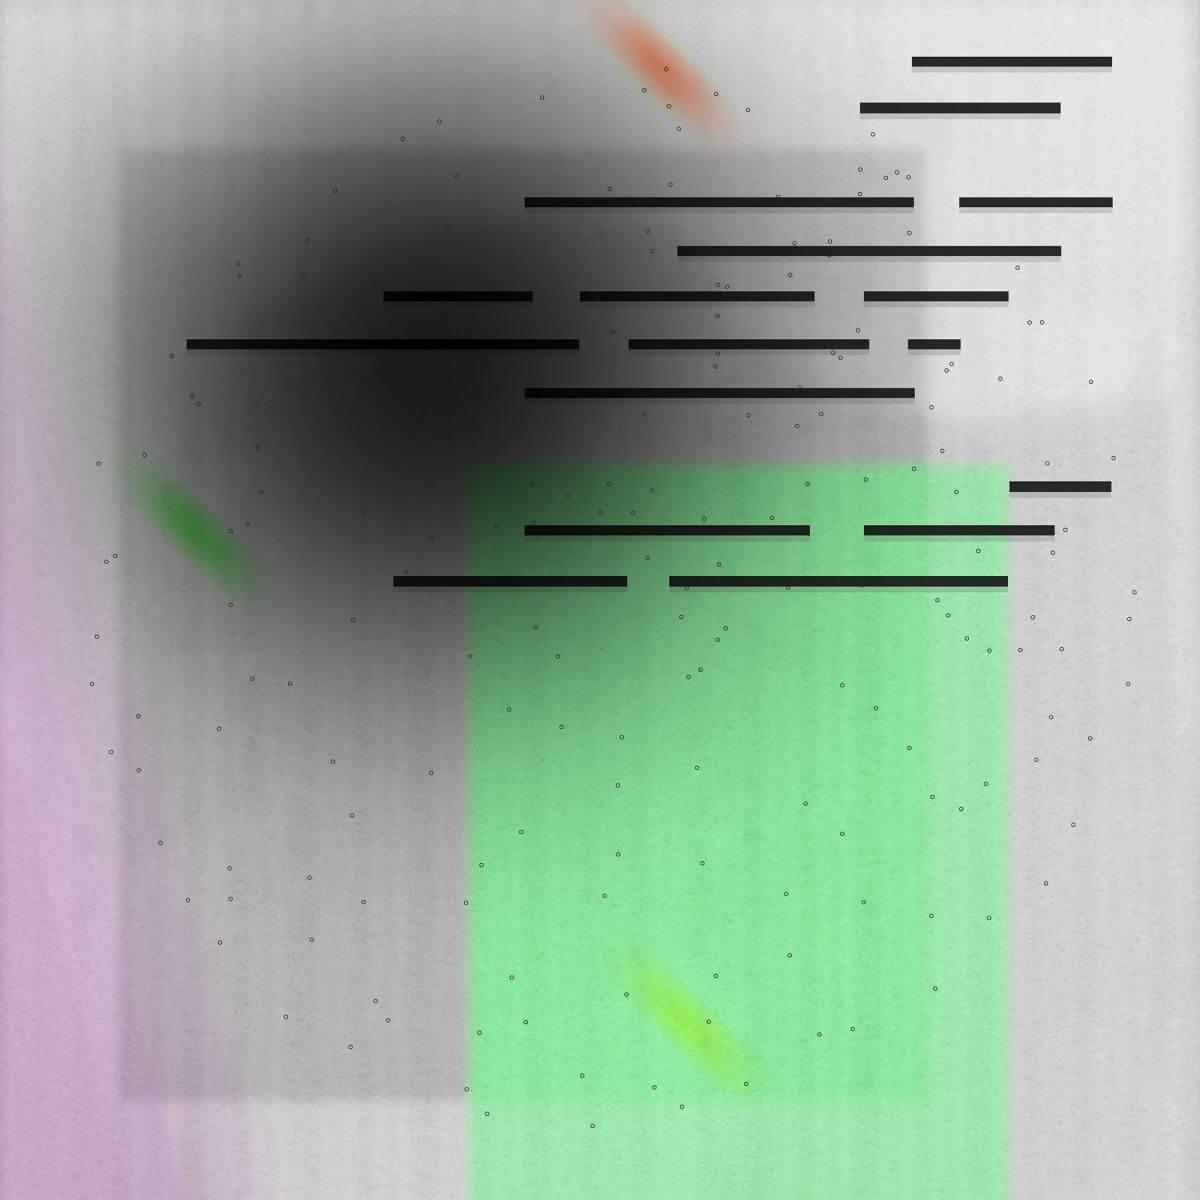 b599ea52e5fc408e5332188e757c626761e81a37